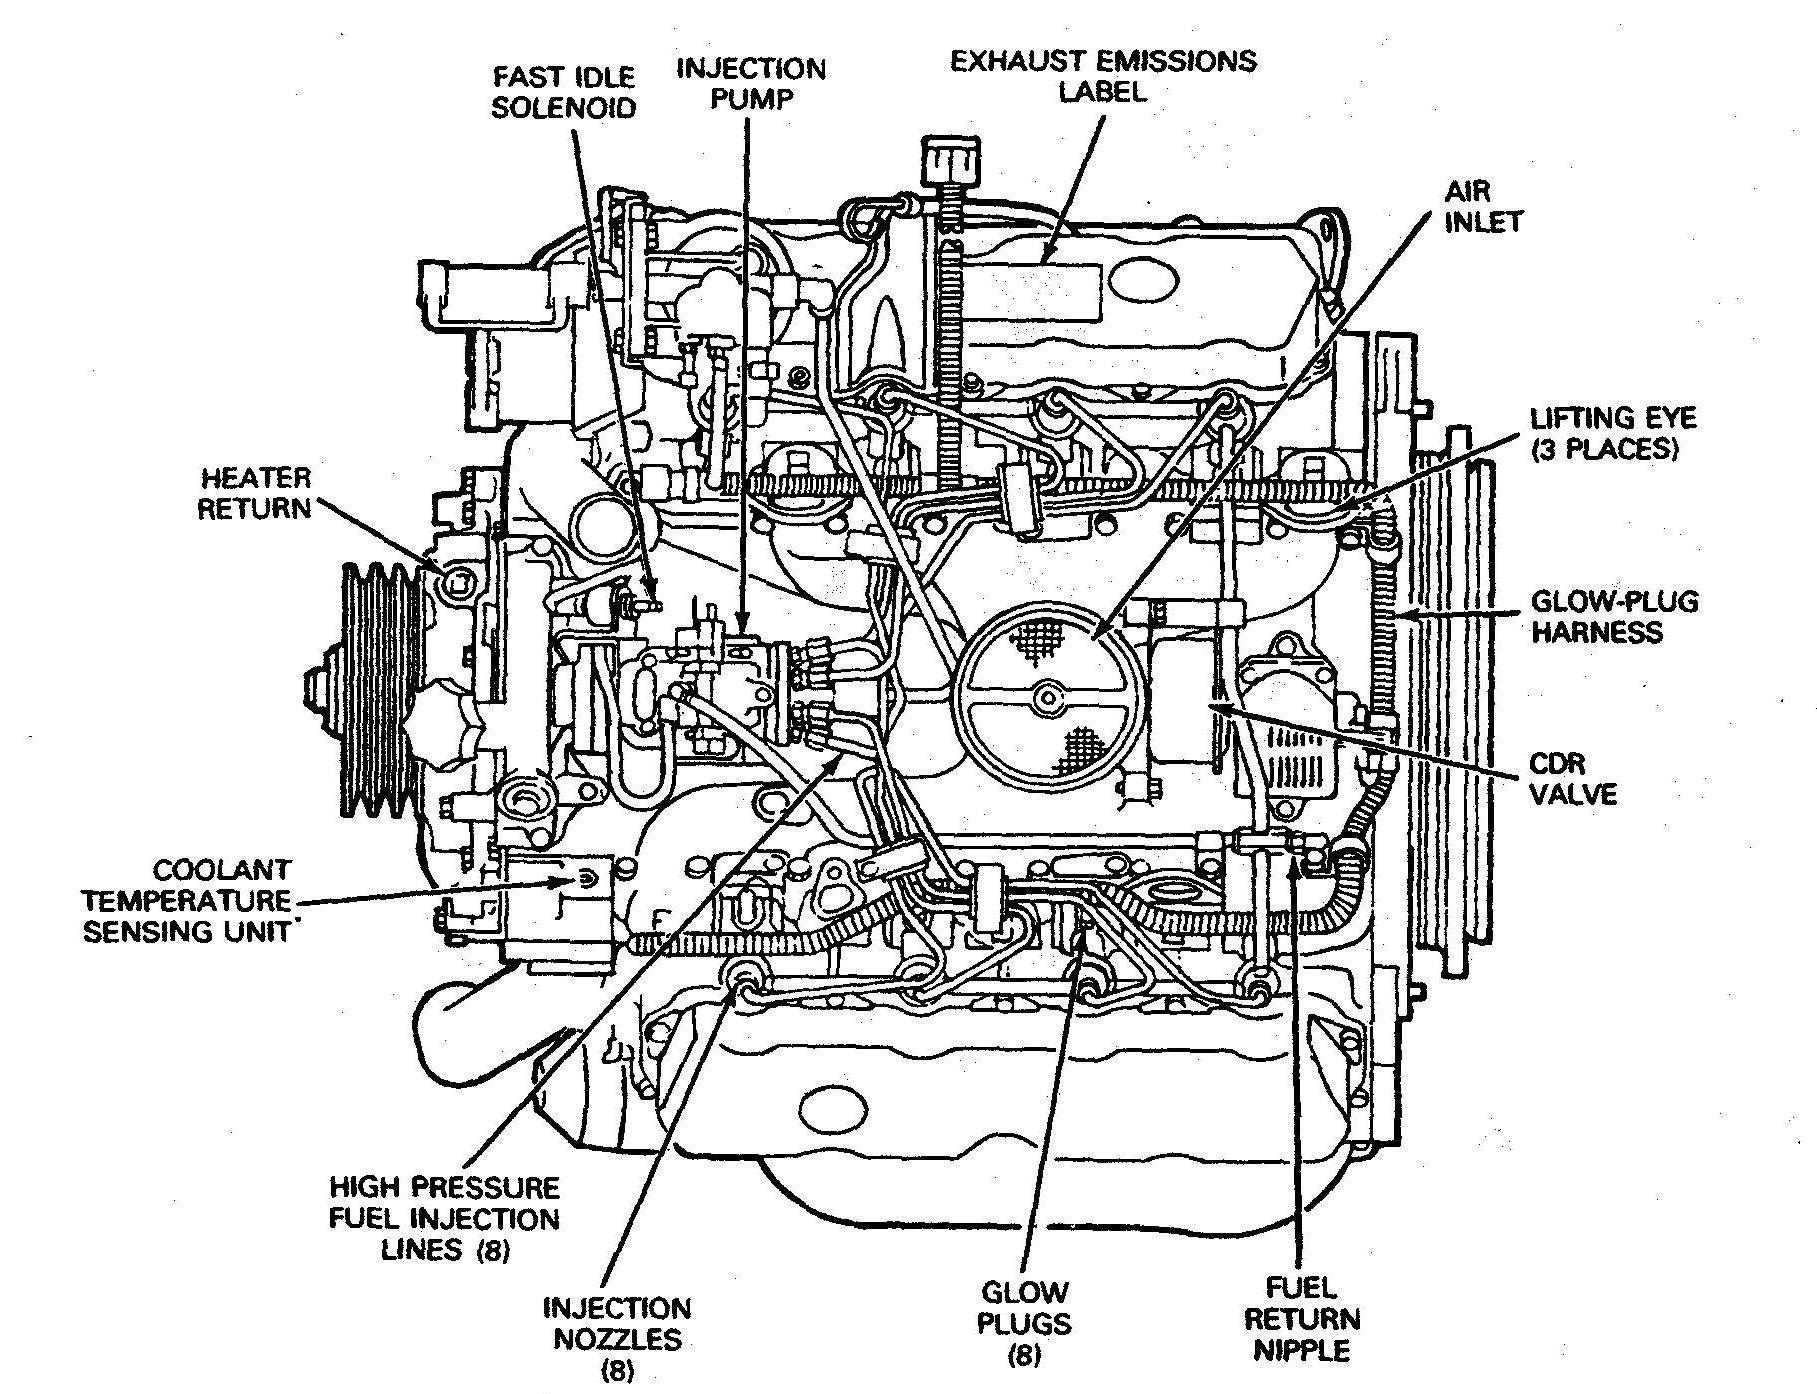 Diesel Engine Diagrams Pictures Automotive Engine Diagram Wiring Diagrams Of Diesel Engine Diagrams Pictures